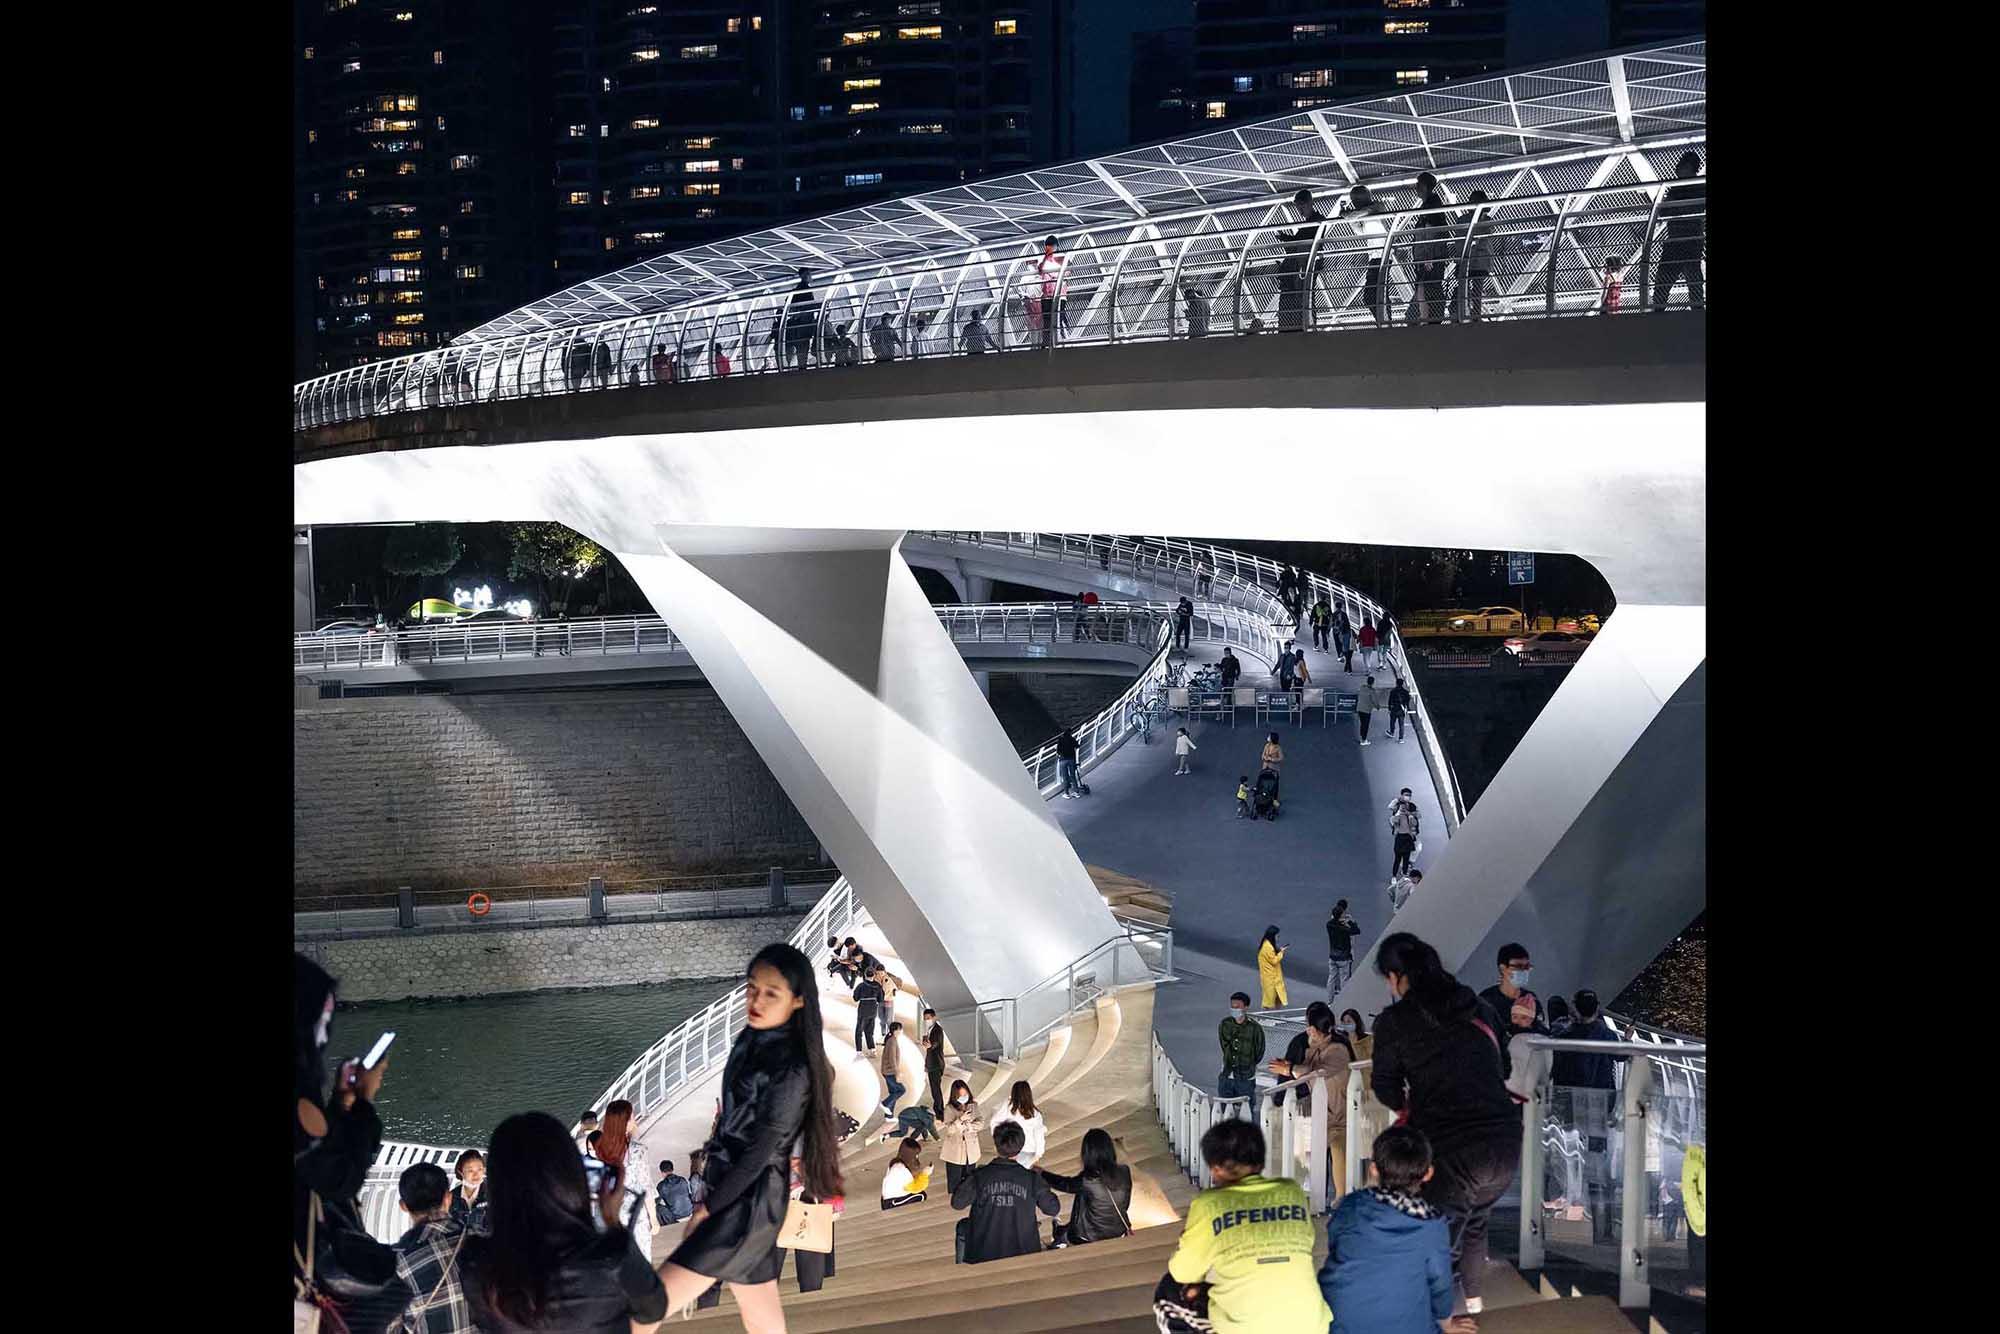 Night Shot 五岔子大橋 - Wuchazi Bridge (INFINITE LOOP)